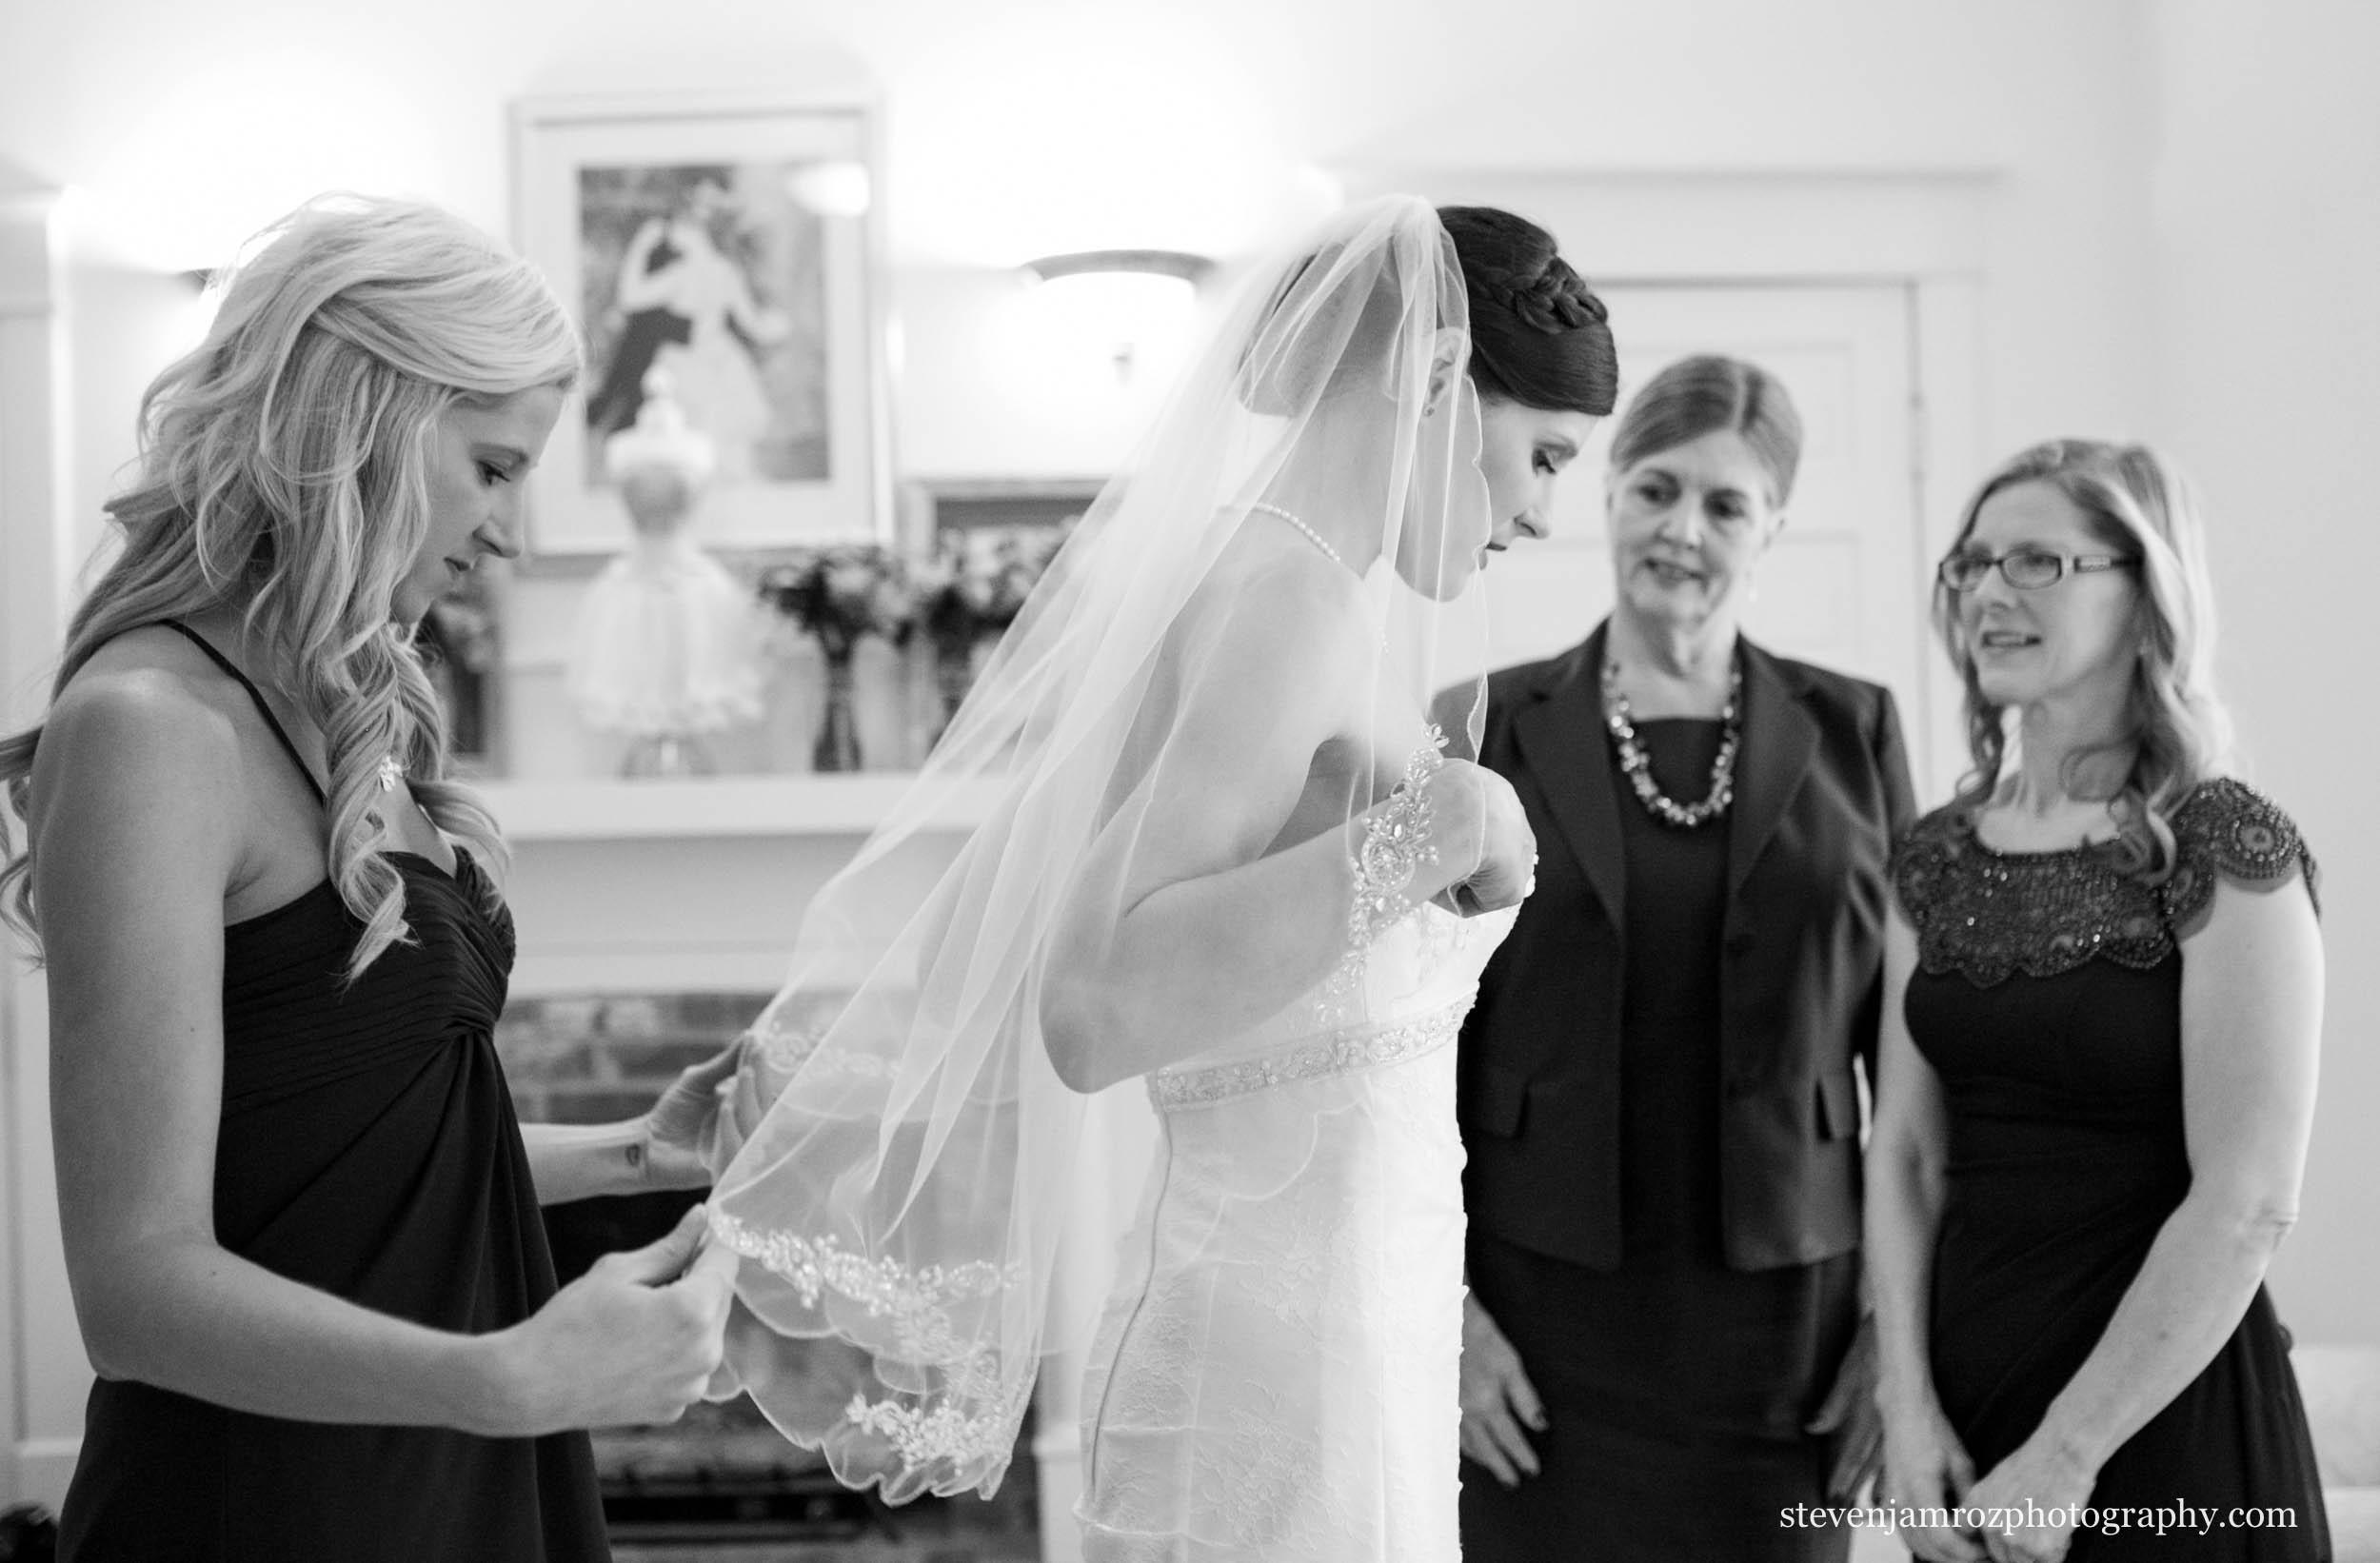 wedding-venues-reviews-hudson-manor-estate-0924.jpg